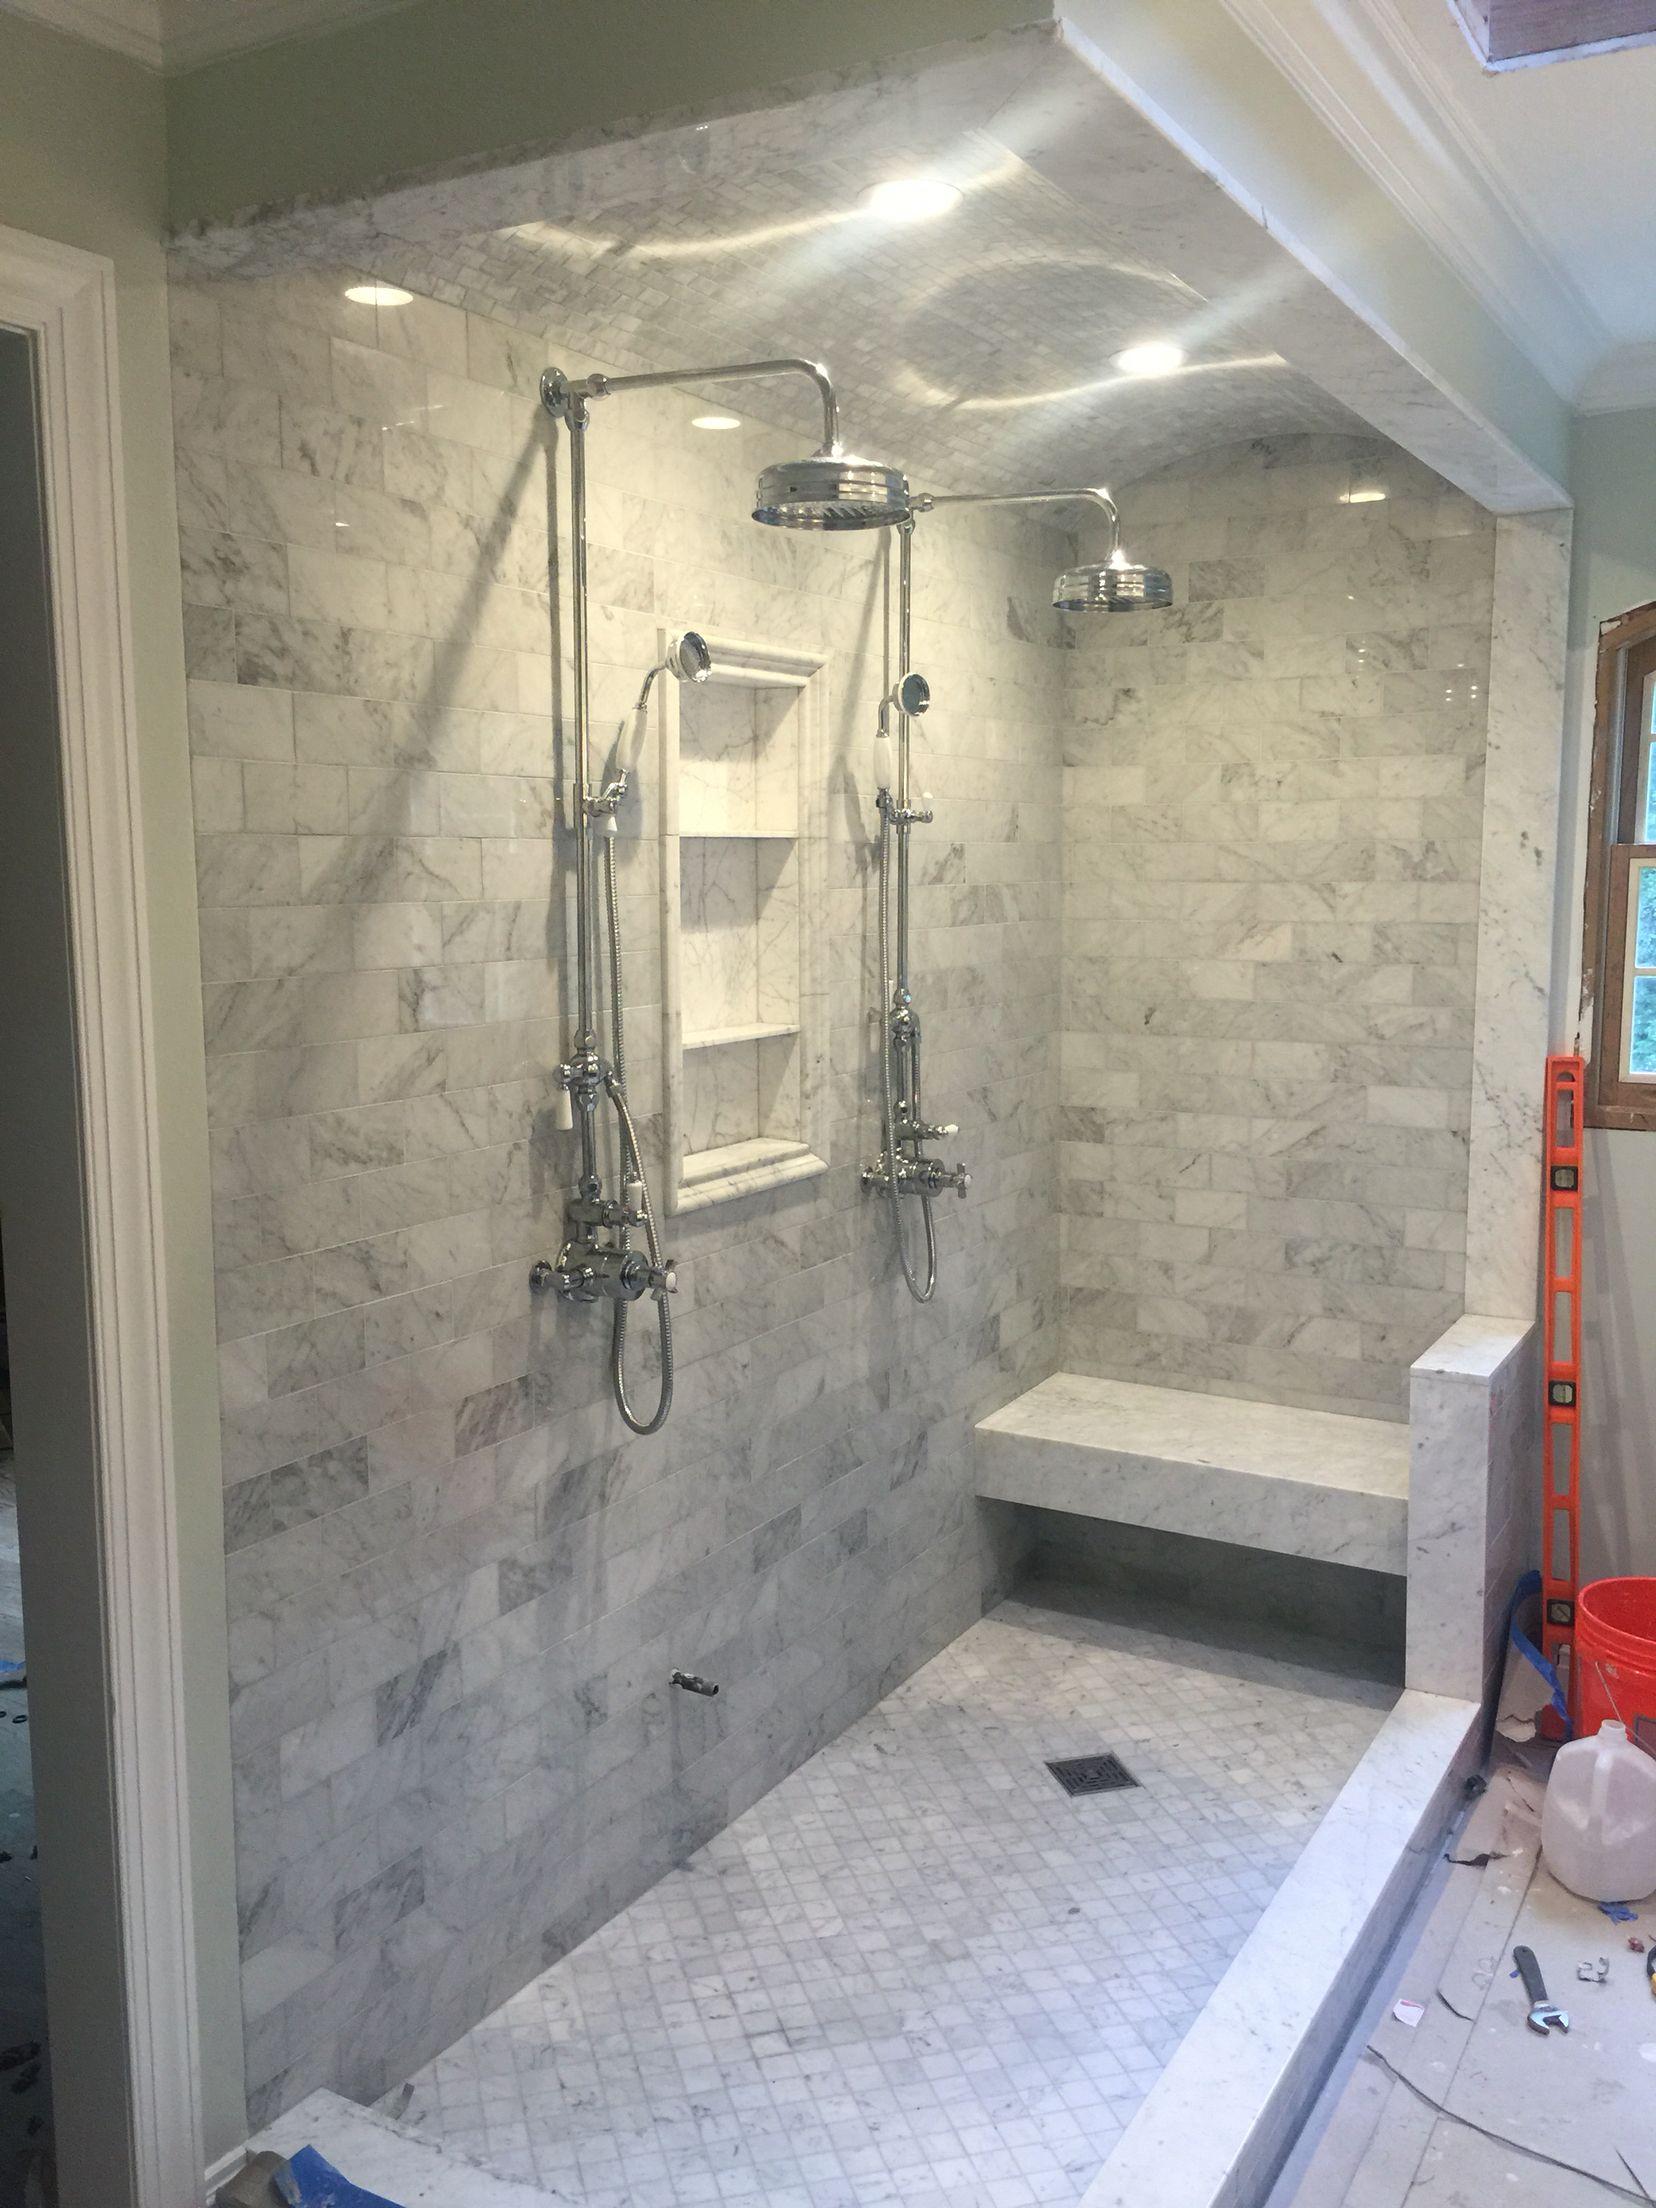 Pin By Ali Horneff On Bathroom Renovation Ideas Bathroom Shower Tile Bathroom Remodel Shower Shower Remodel